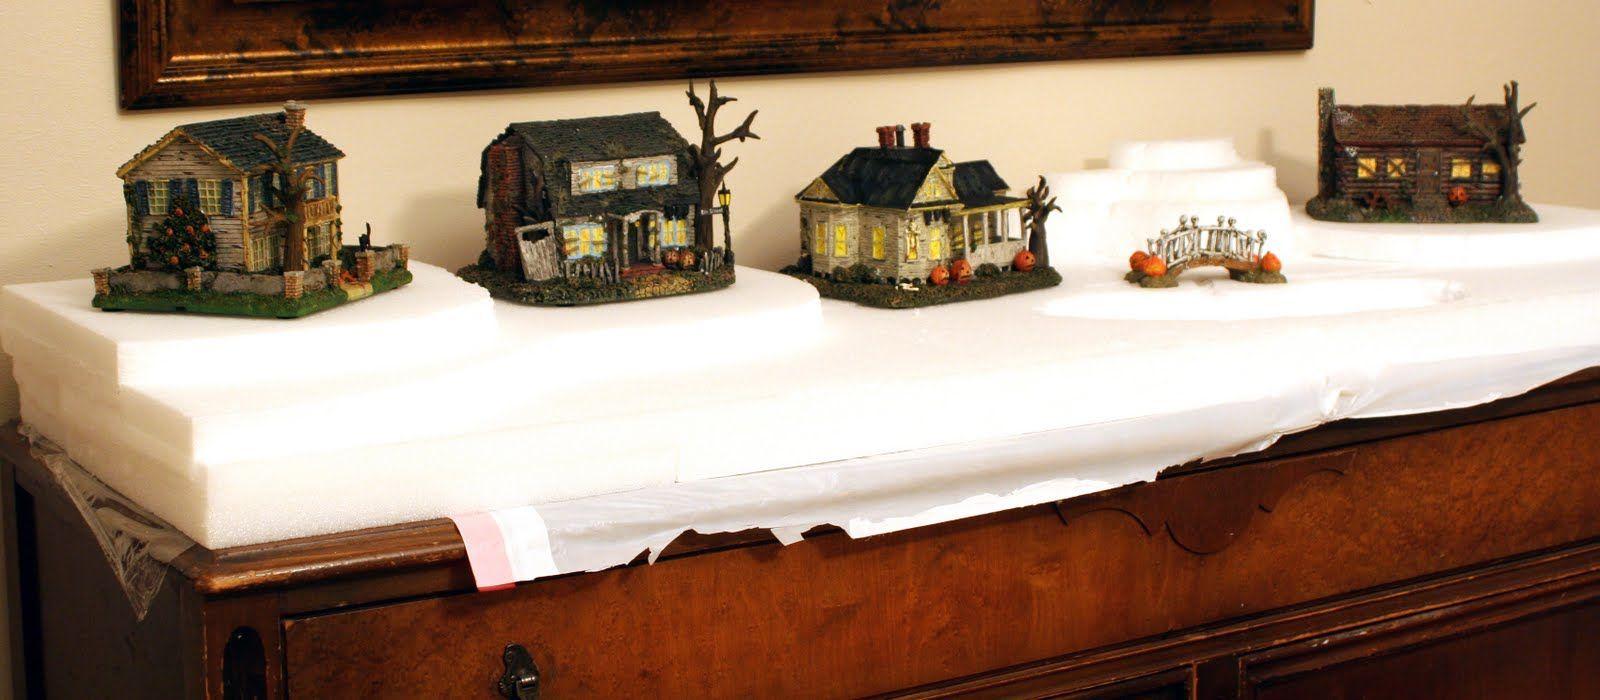 Christmas Village Platforms.Dirt Cheap Decor Halloween Village Platform Can Be Used